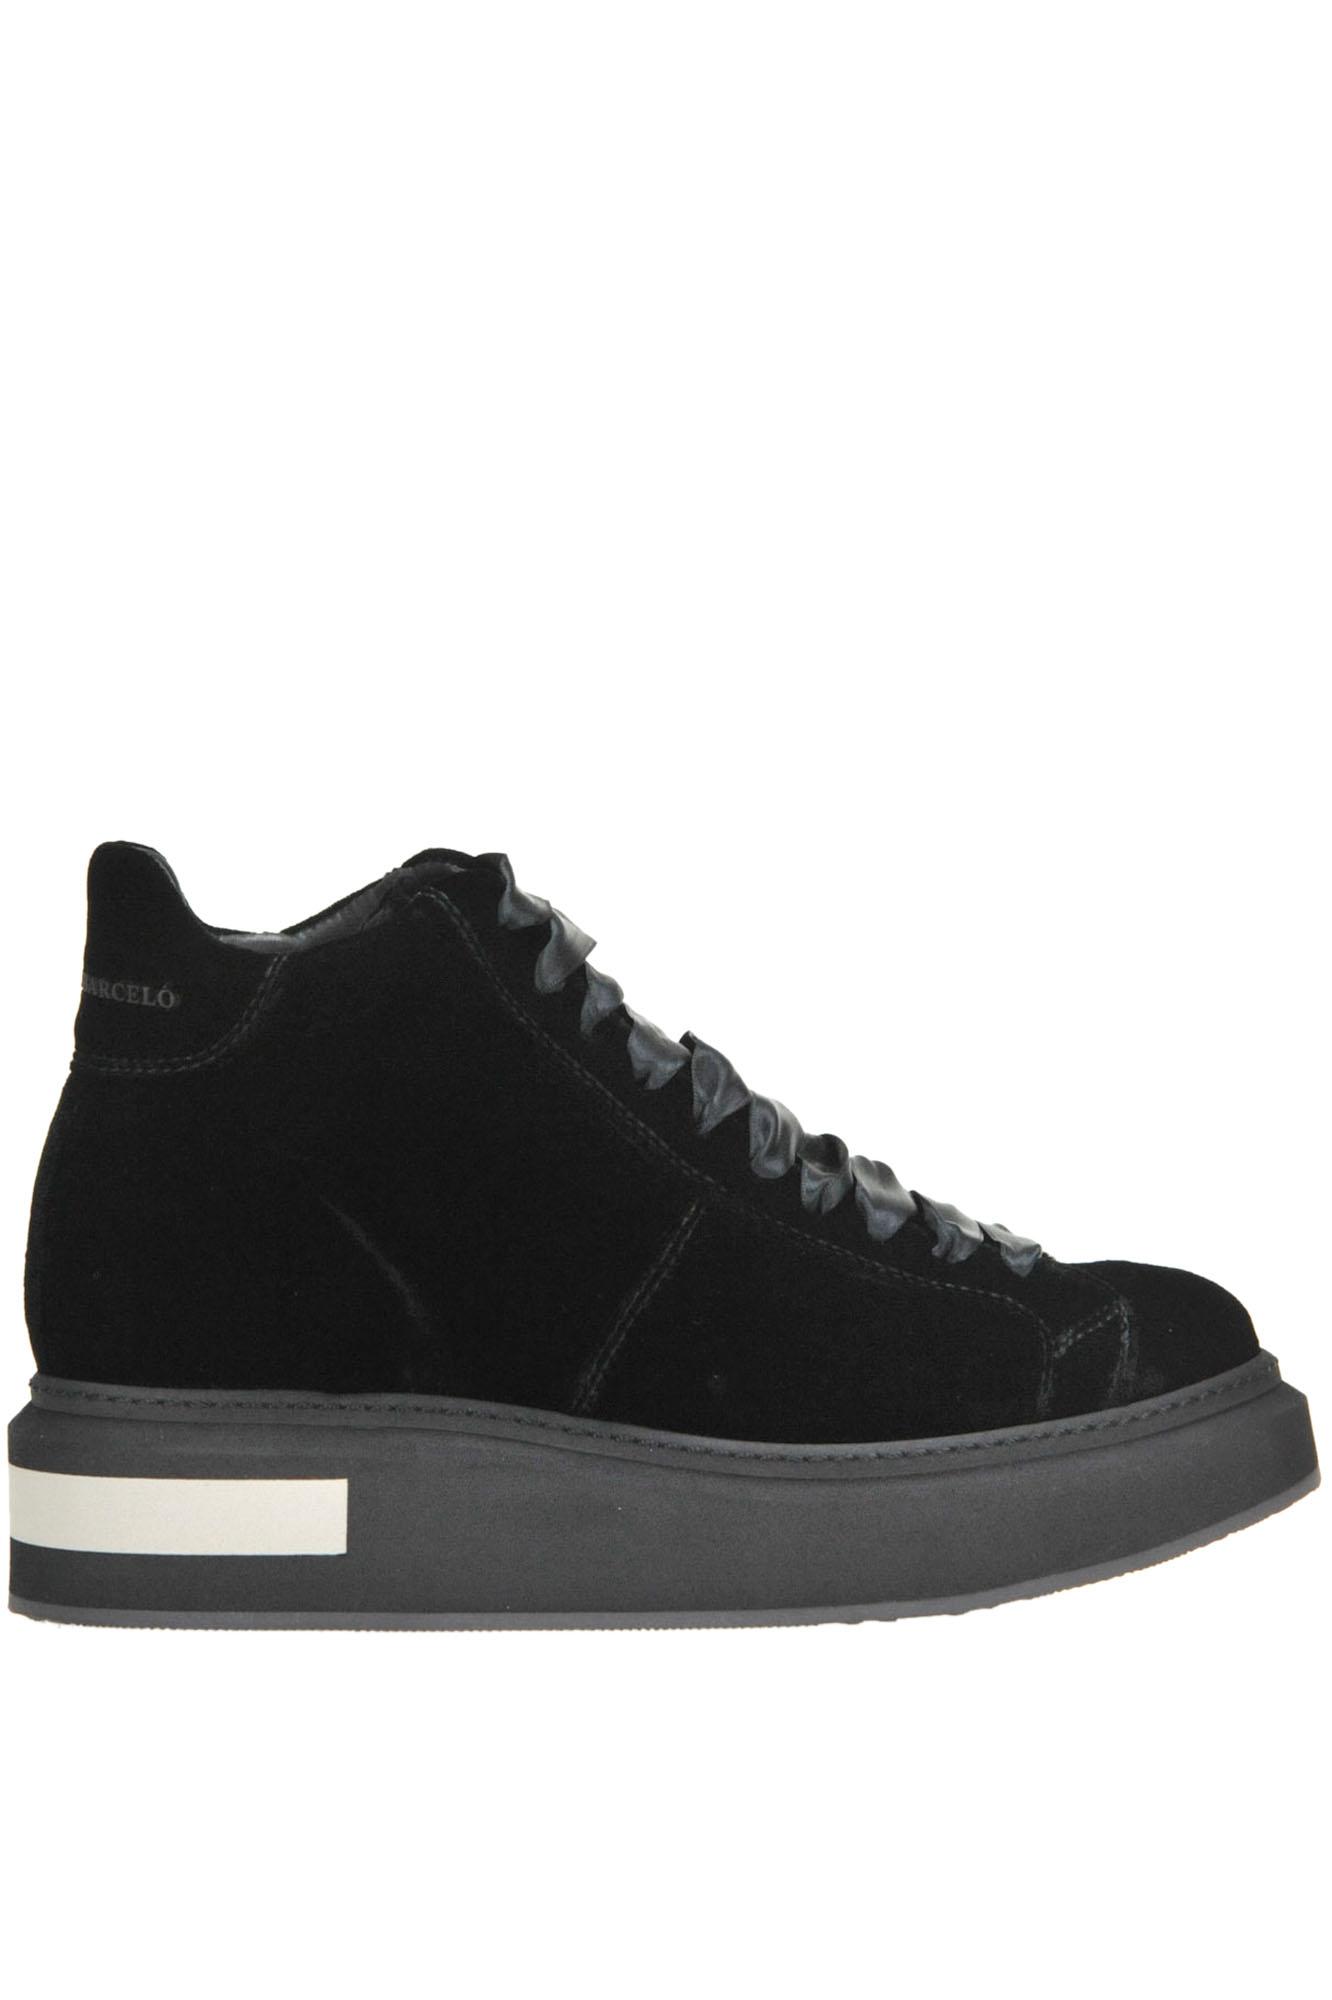 Mitte Round Velvet High-Top Sneakers in Black